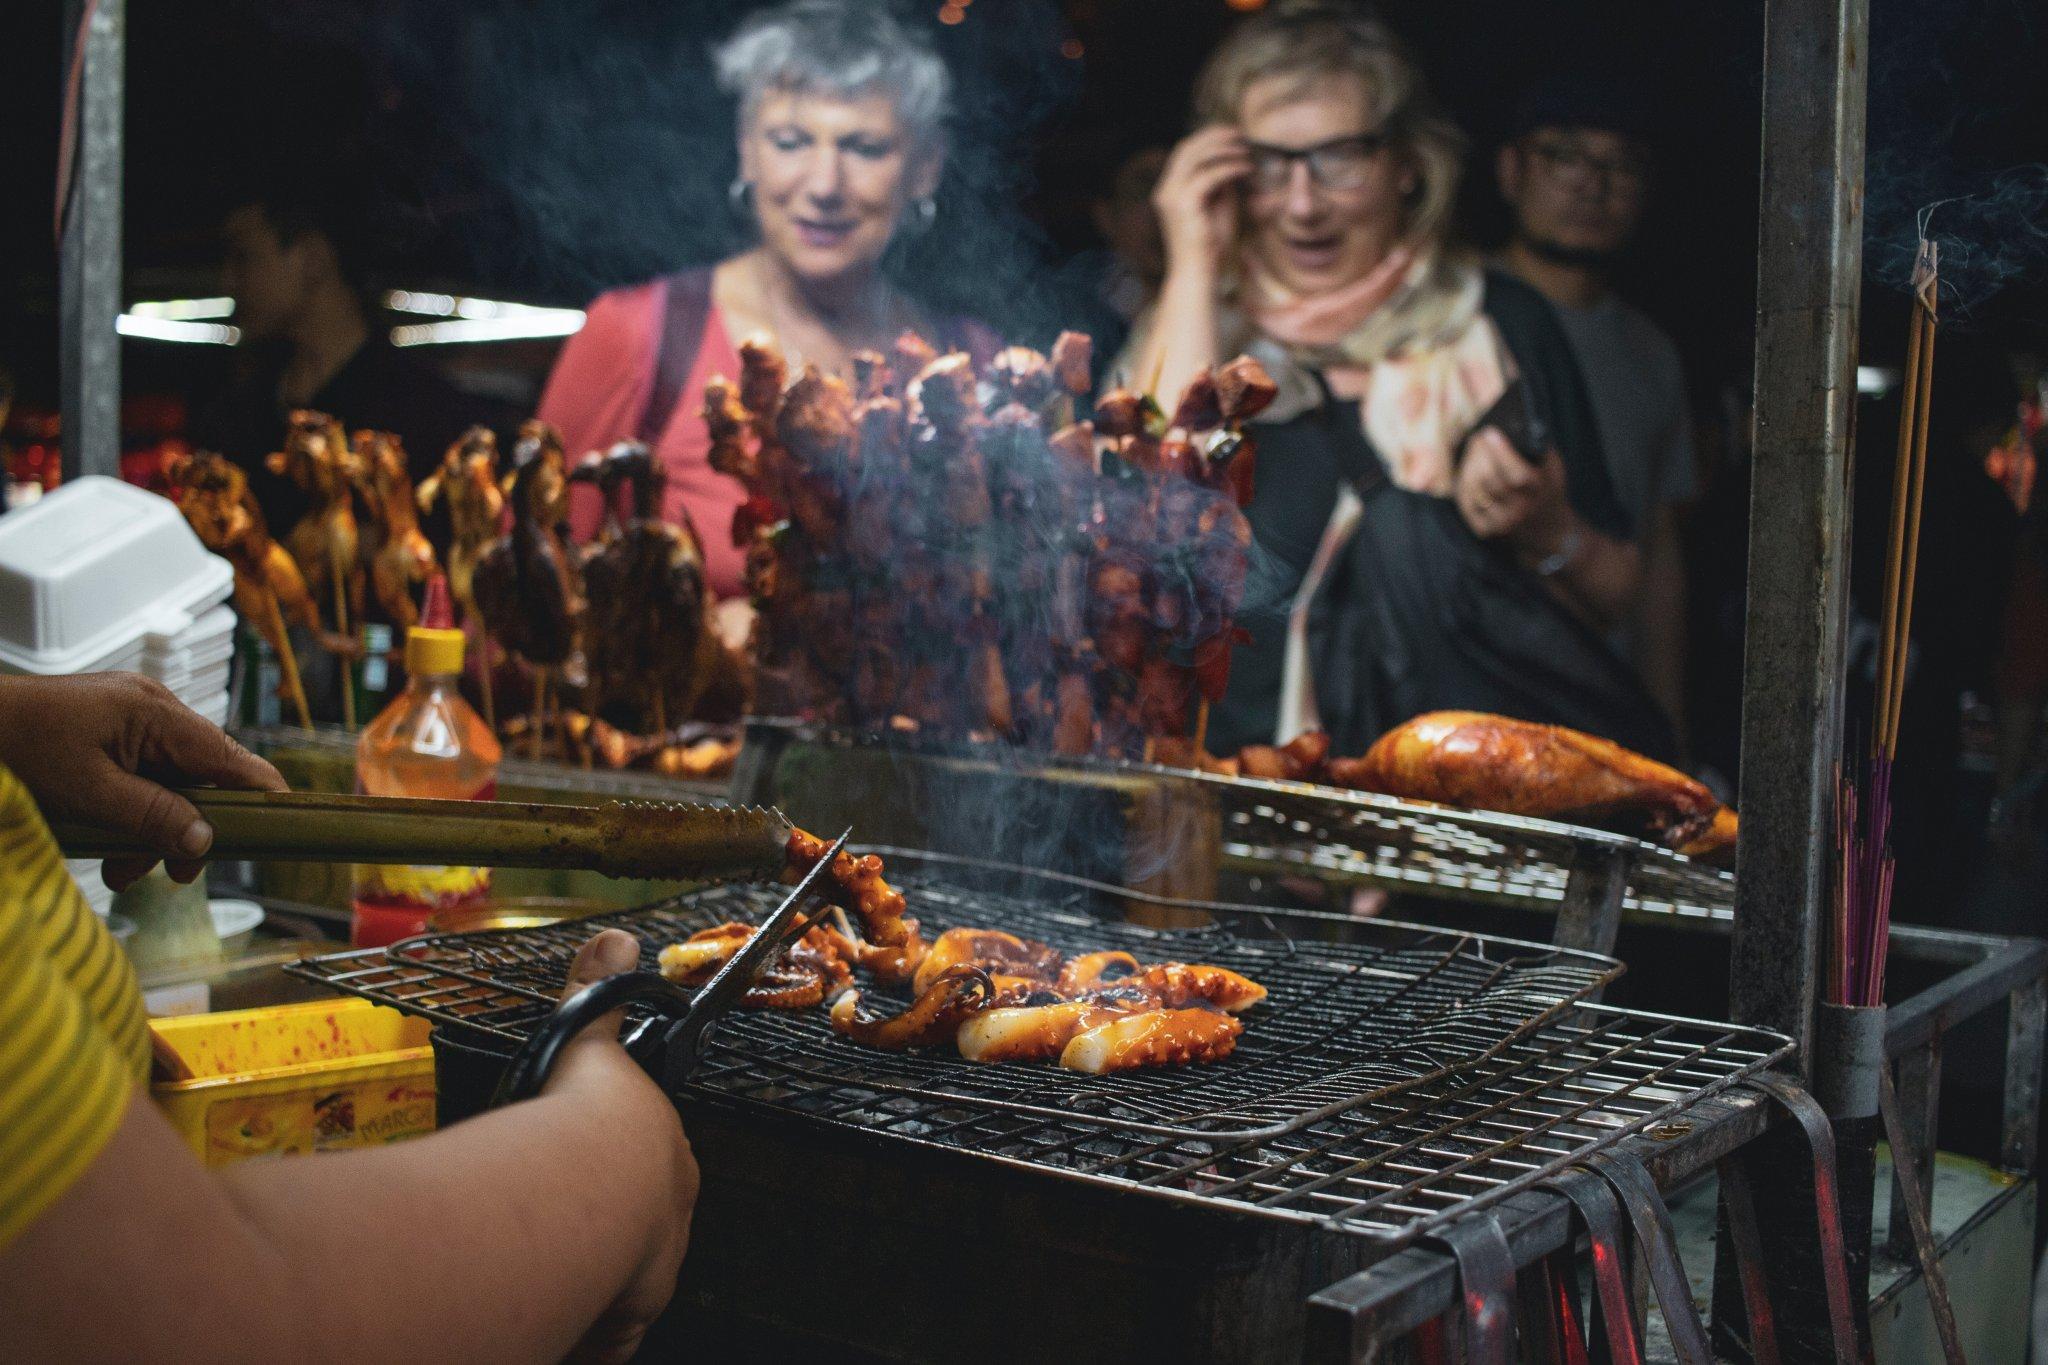 Women staring at food being made